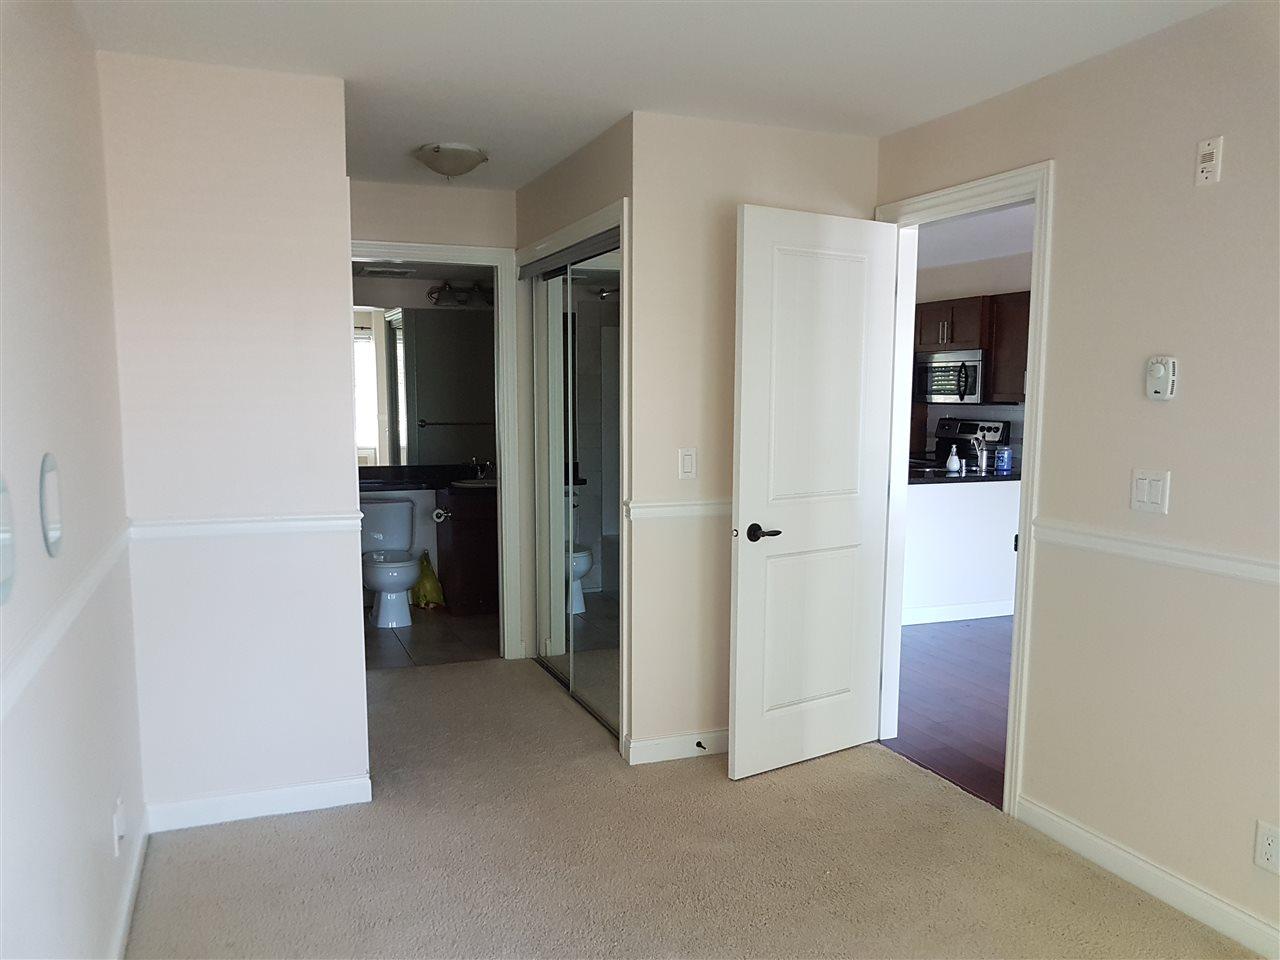 Condo Apartment at 273 20170 FRASER HIGHWAY, Unit 273, Langley, British Columbia. Image 8